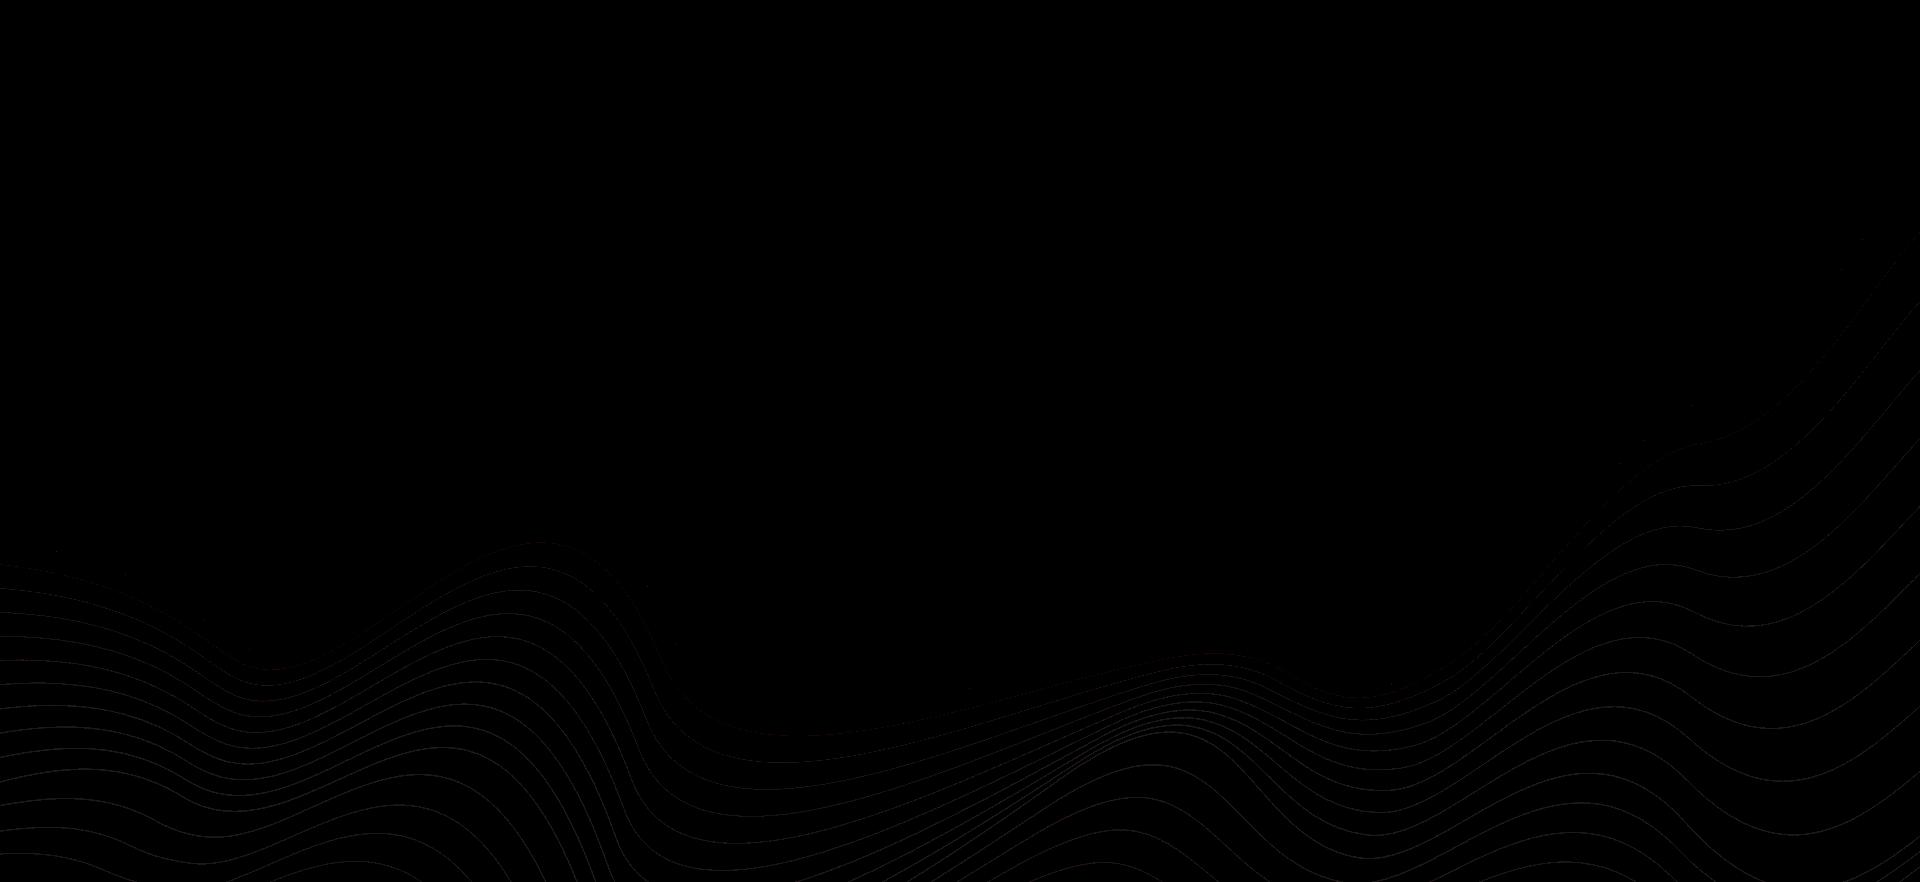 Masked group wave lines